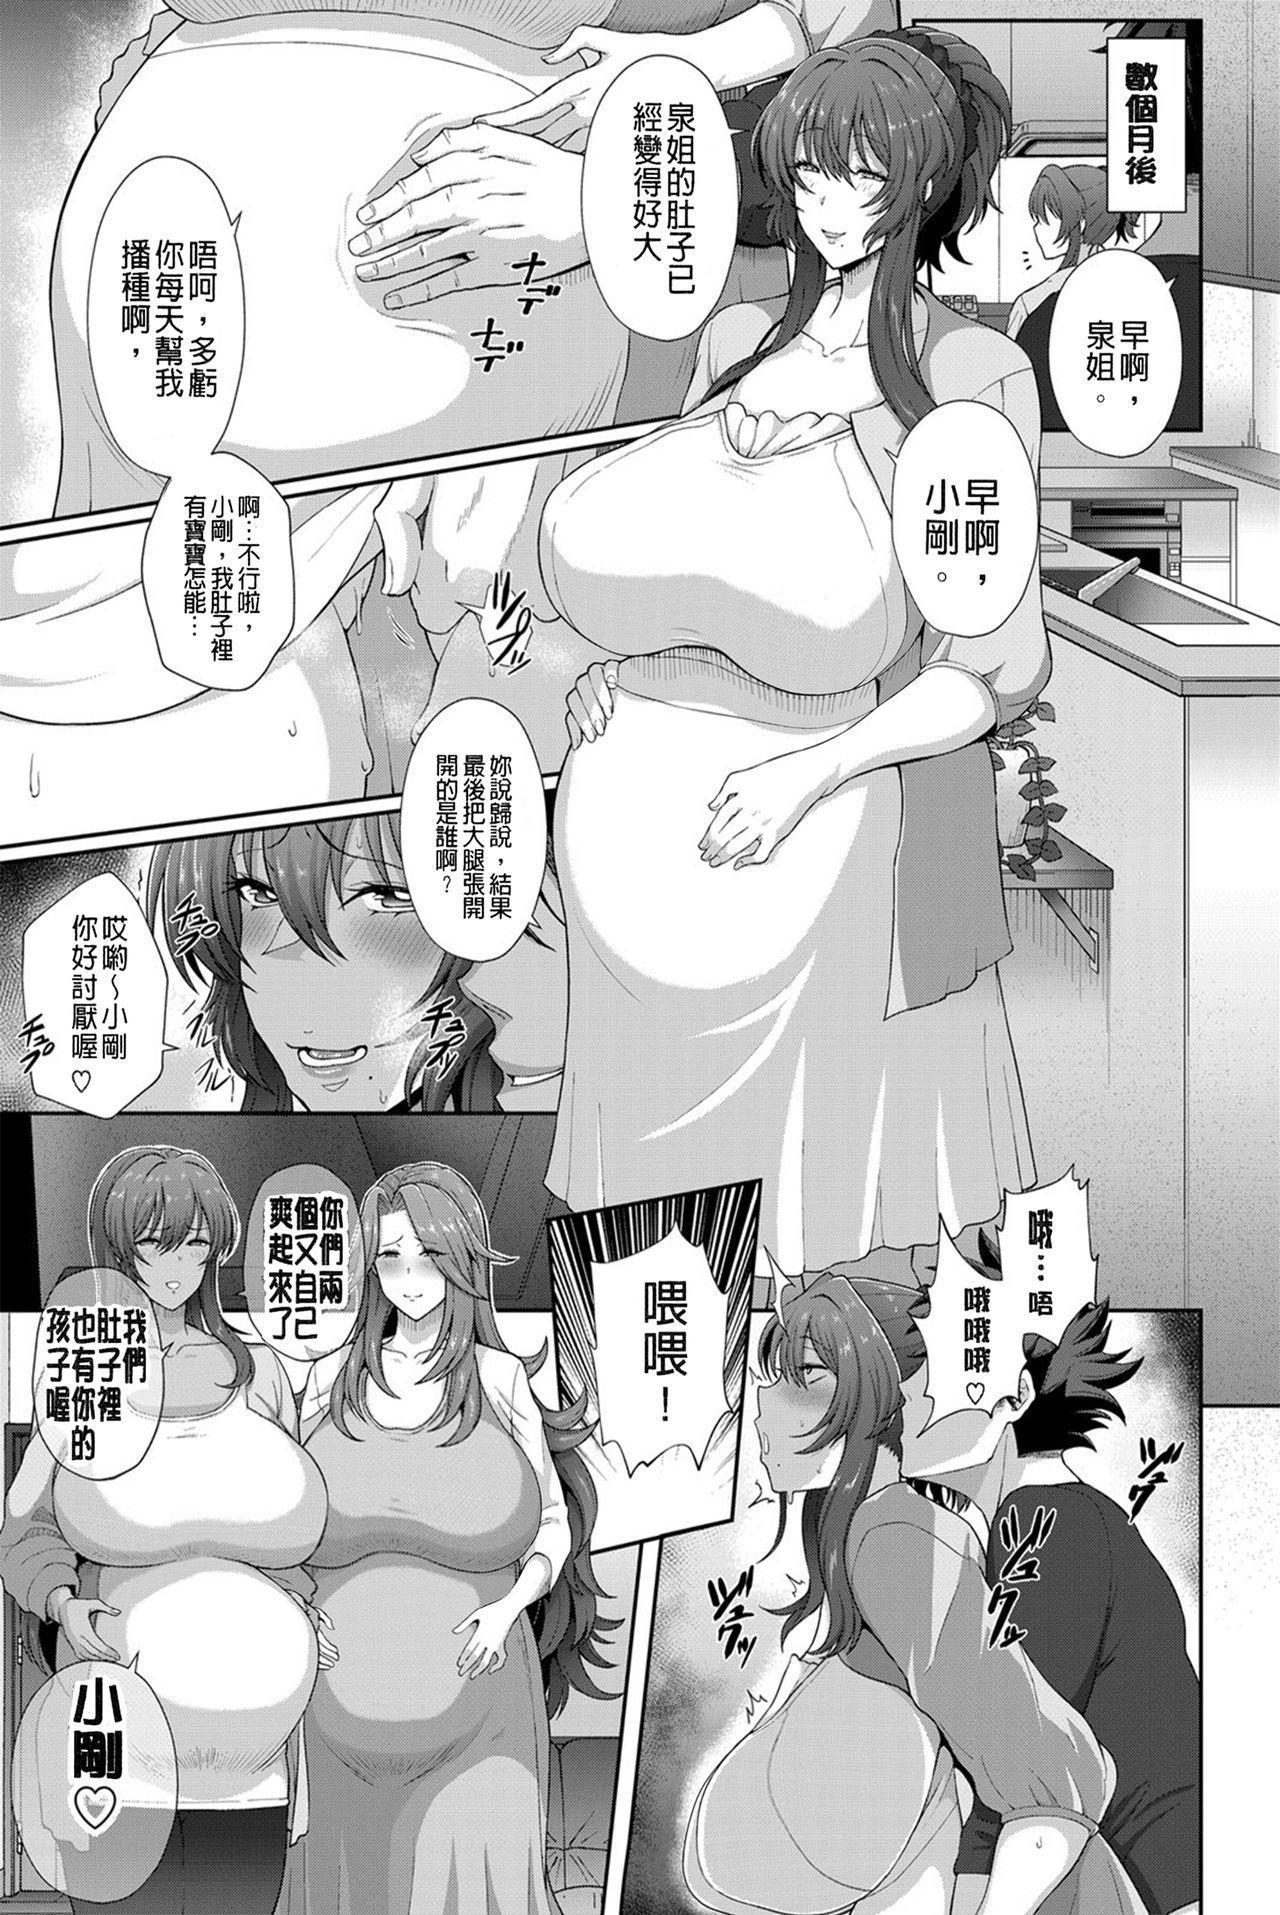 Juku Mesu - Erotic Mature Women 97